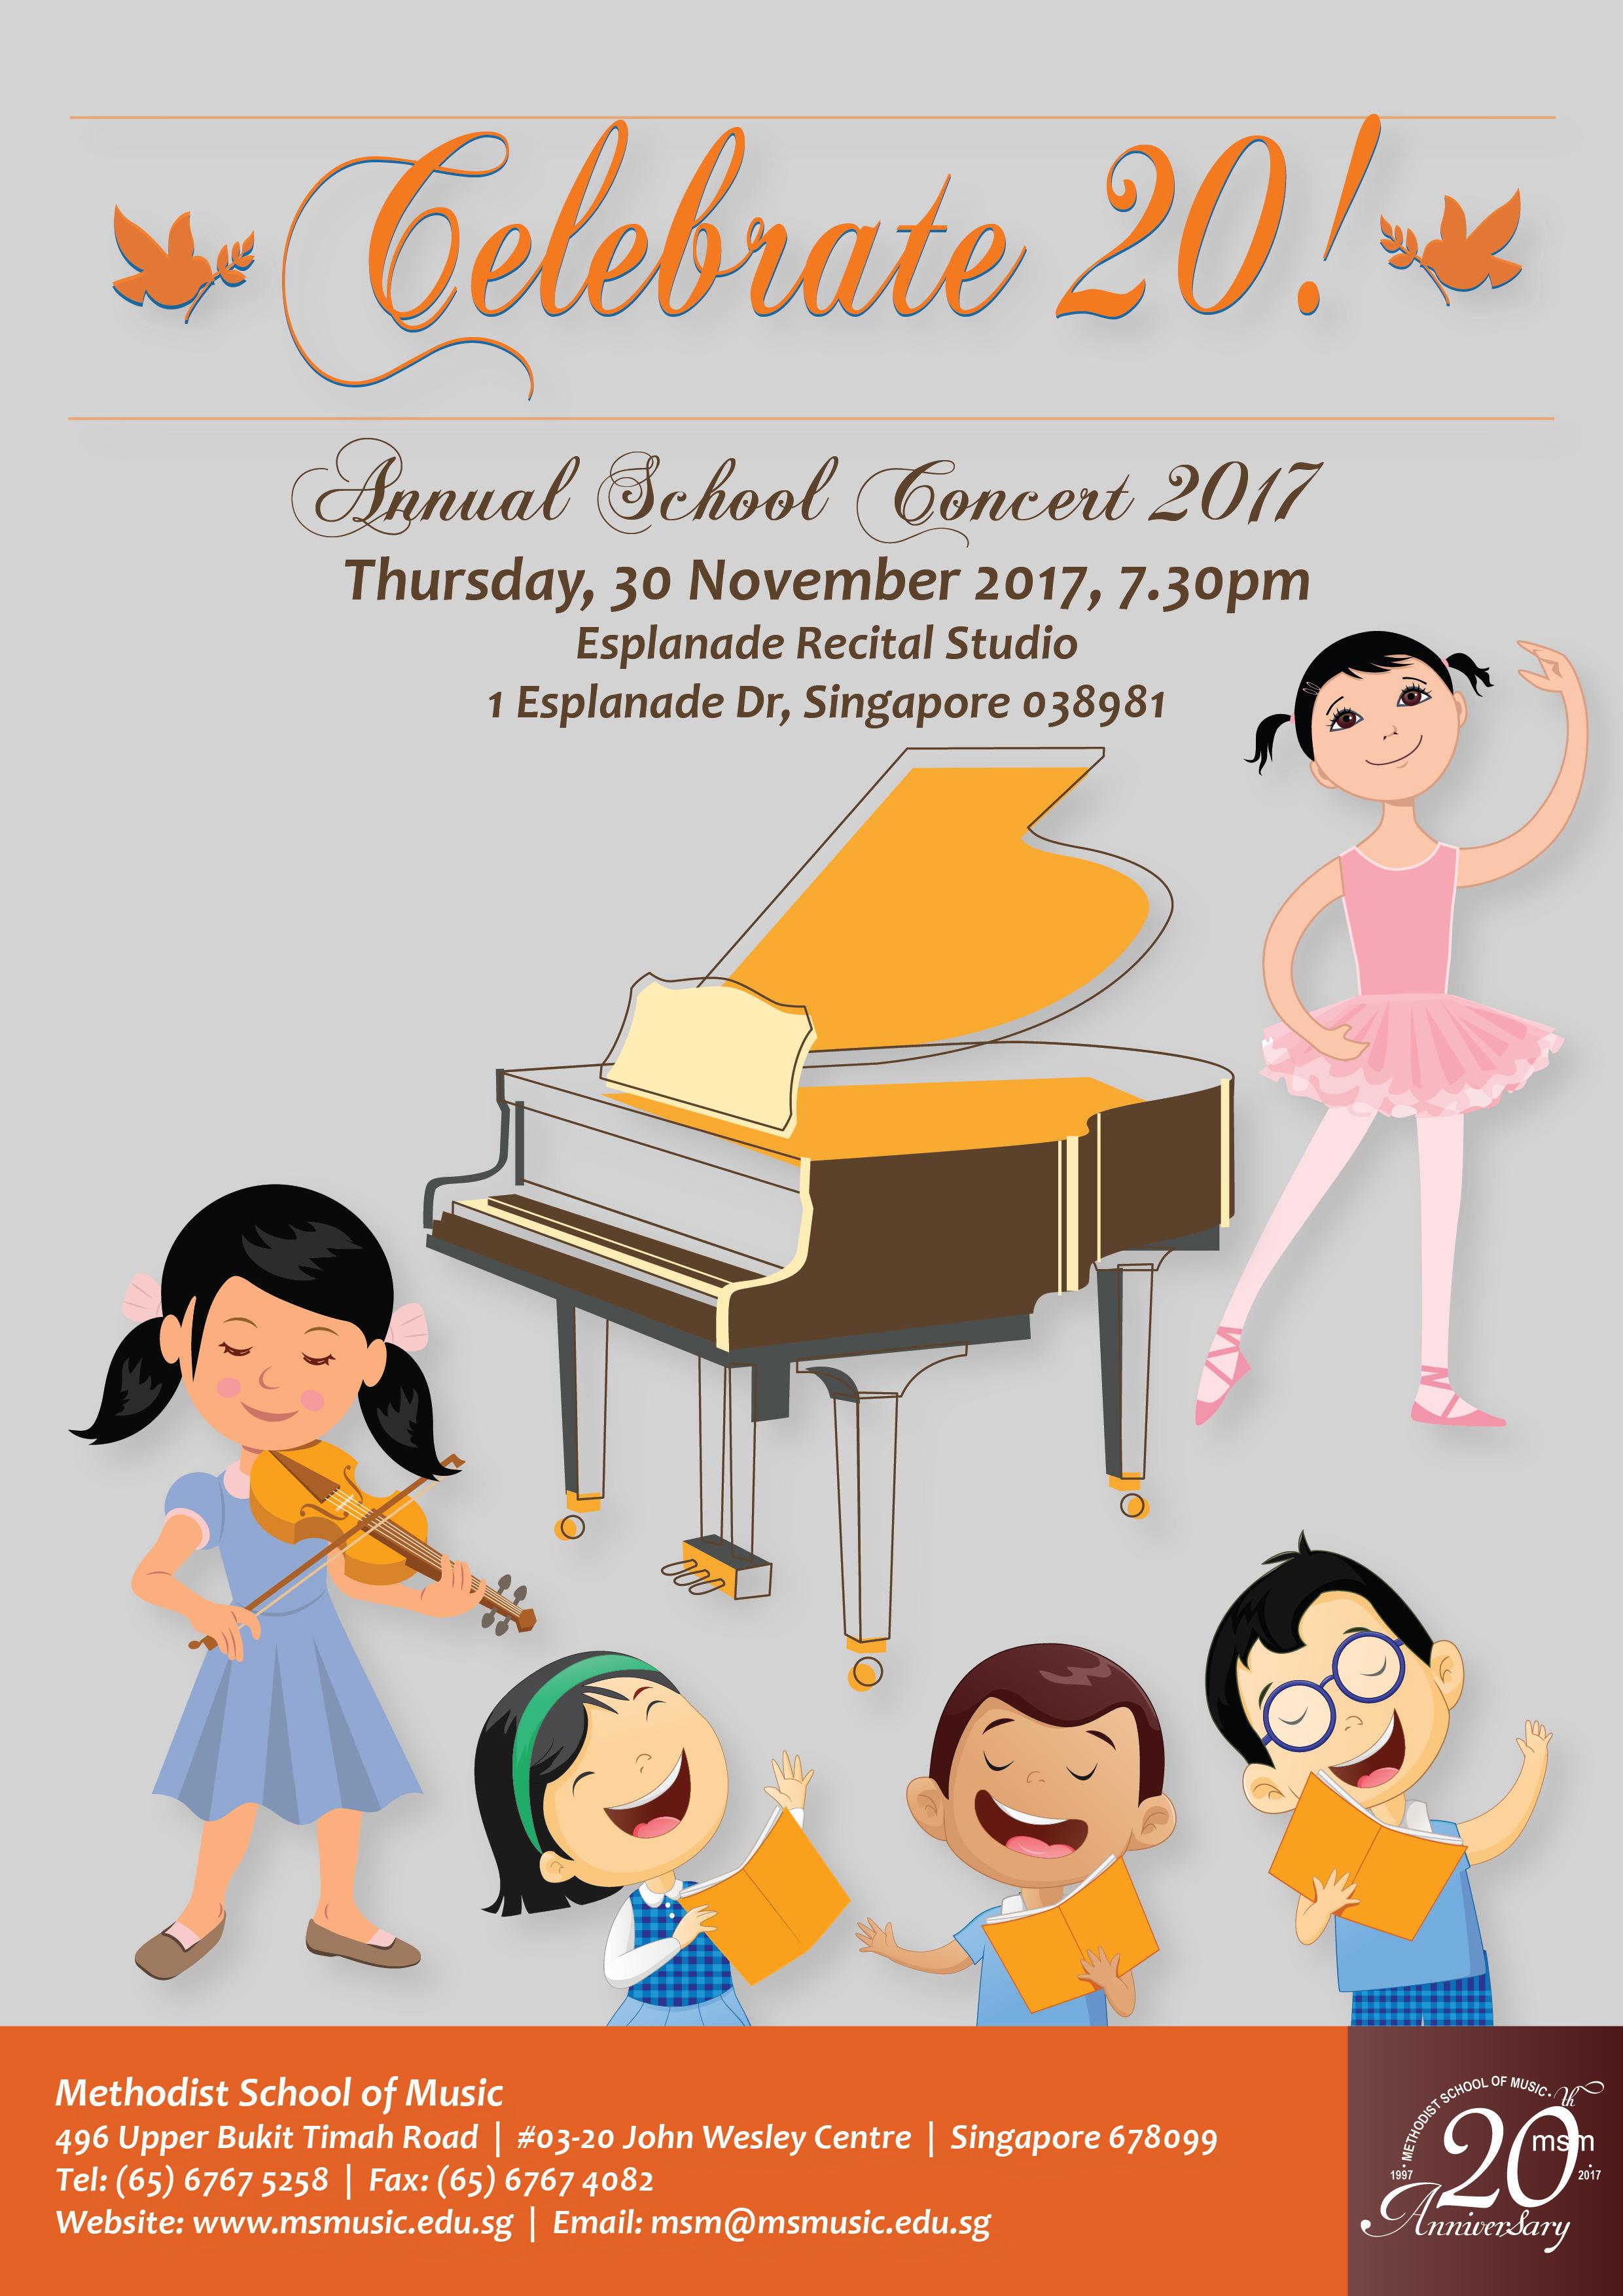 Annual School Concert – Celebrate 20!